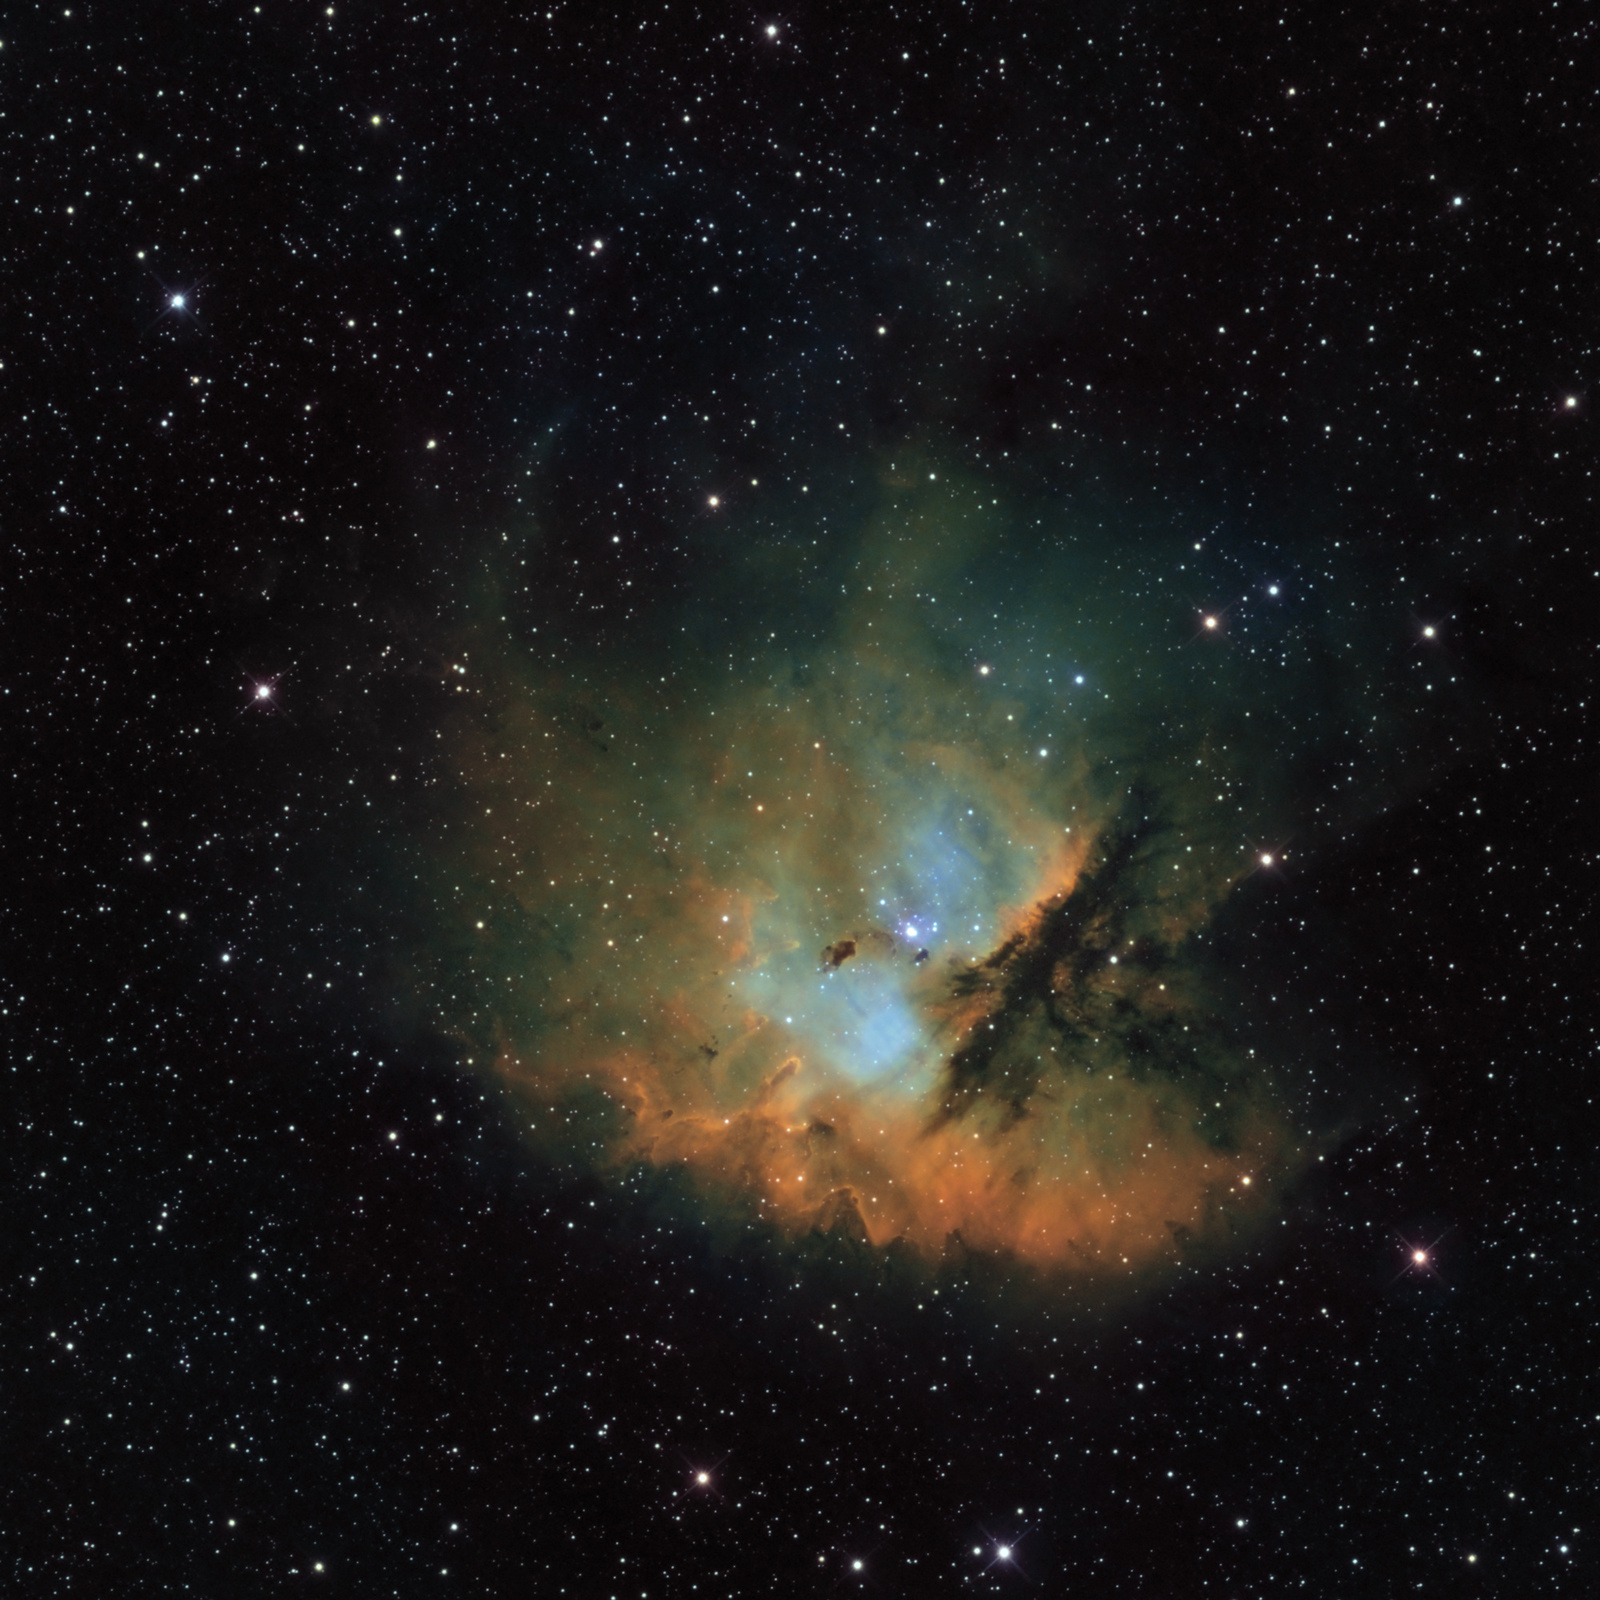 NGC281_SHO_fl.thumb.jpg.17af65a19f3f734e28e88f62d9f530a4.jpg